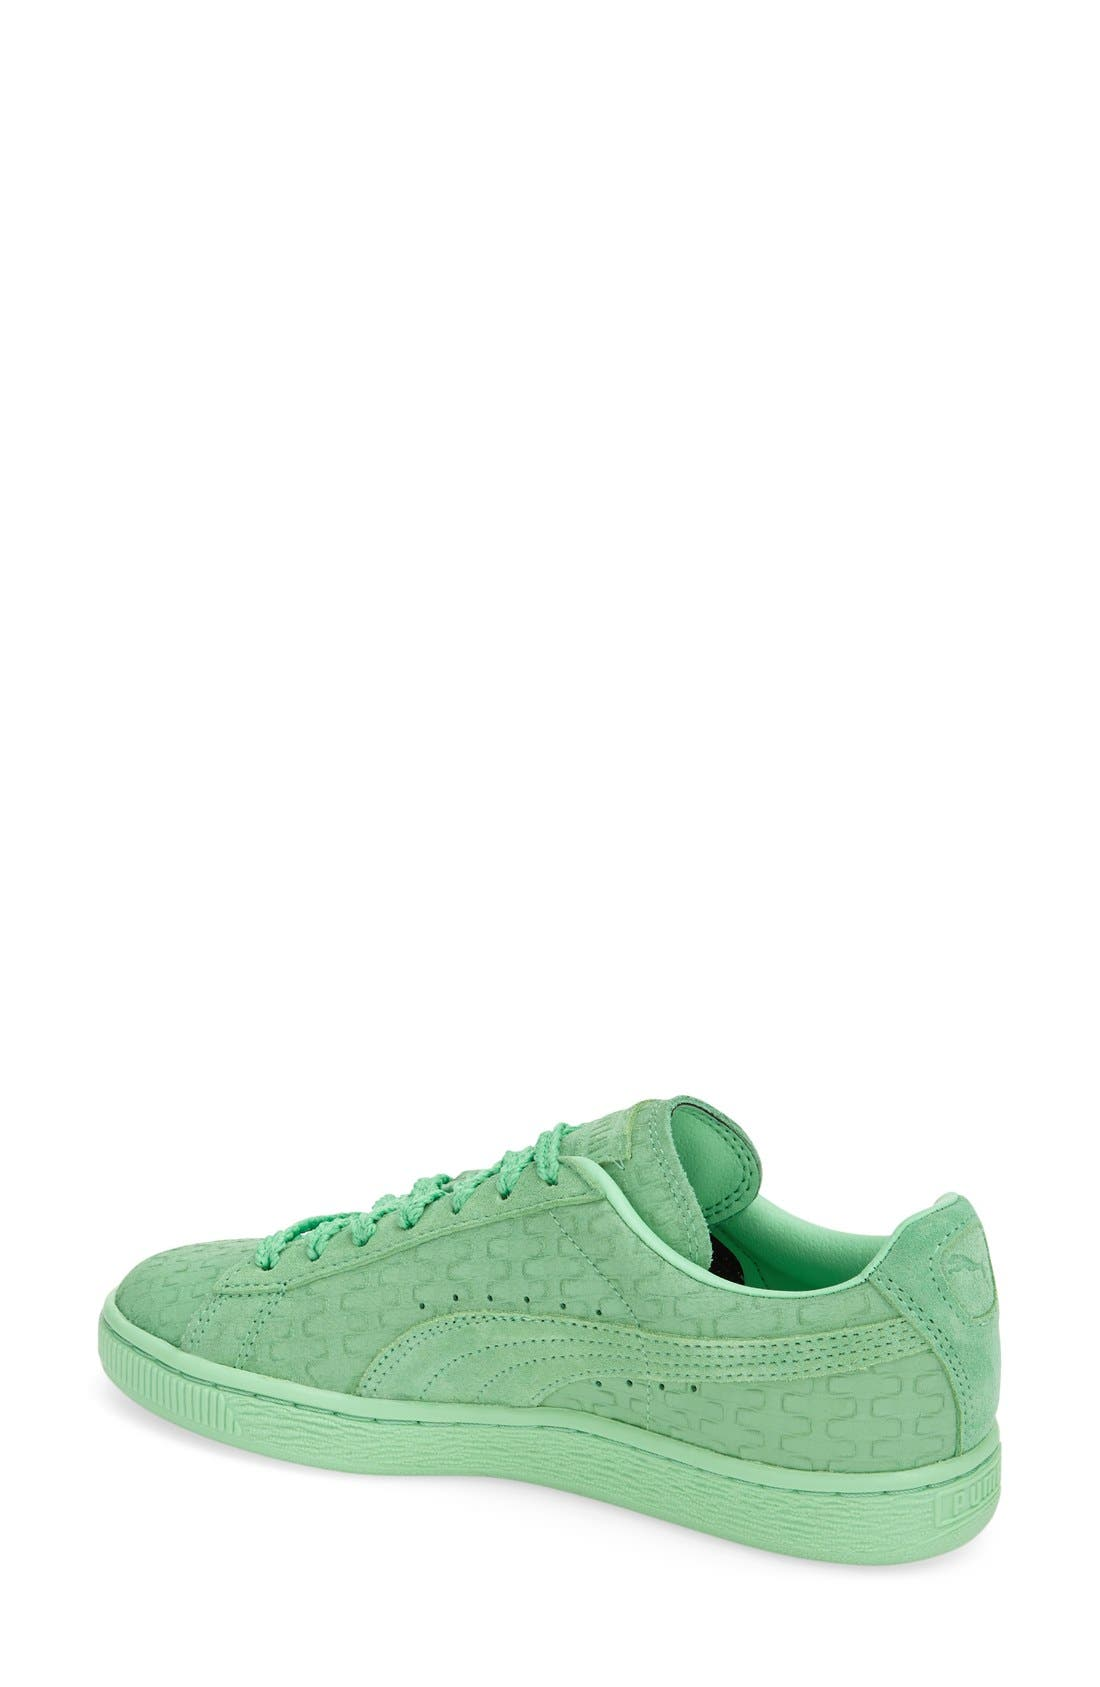 'Suede Classic - Solange' Sneaker,                             Alternate thumbnail 3, color,                             300